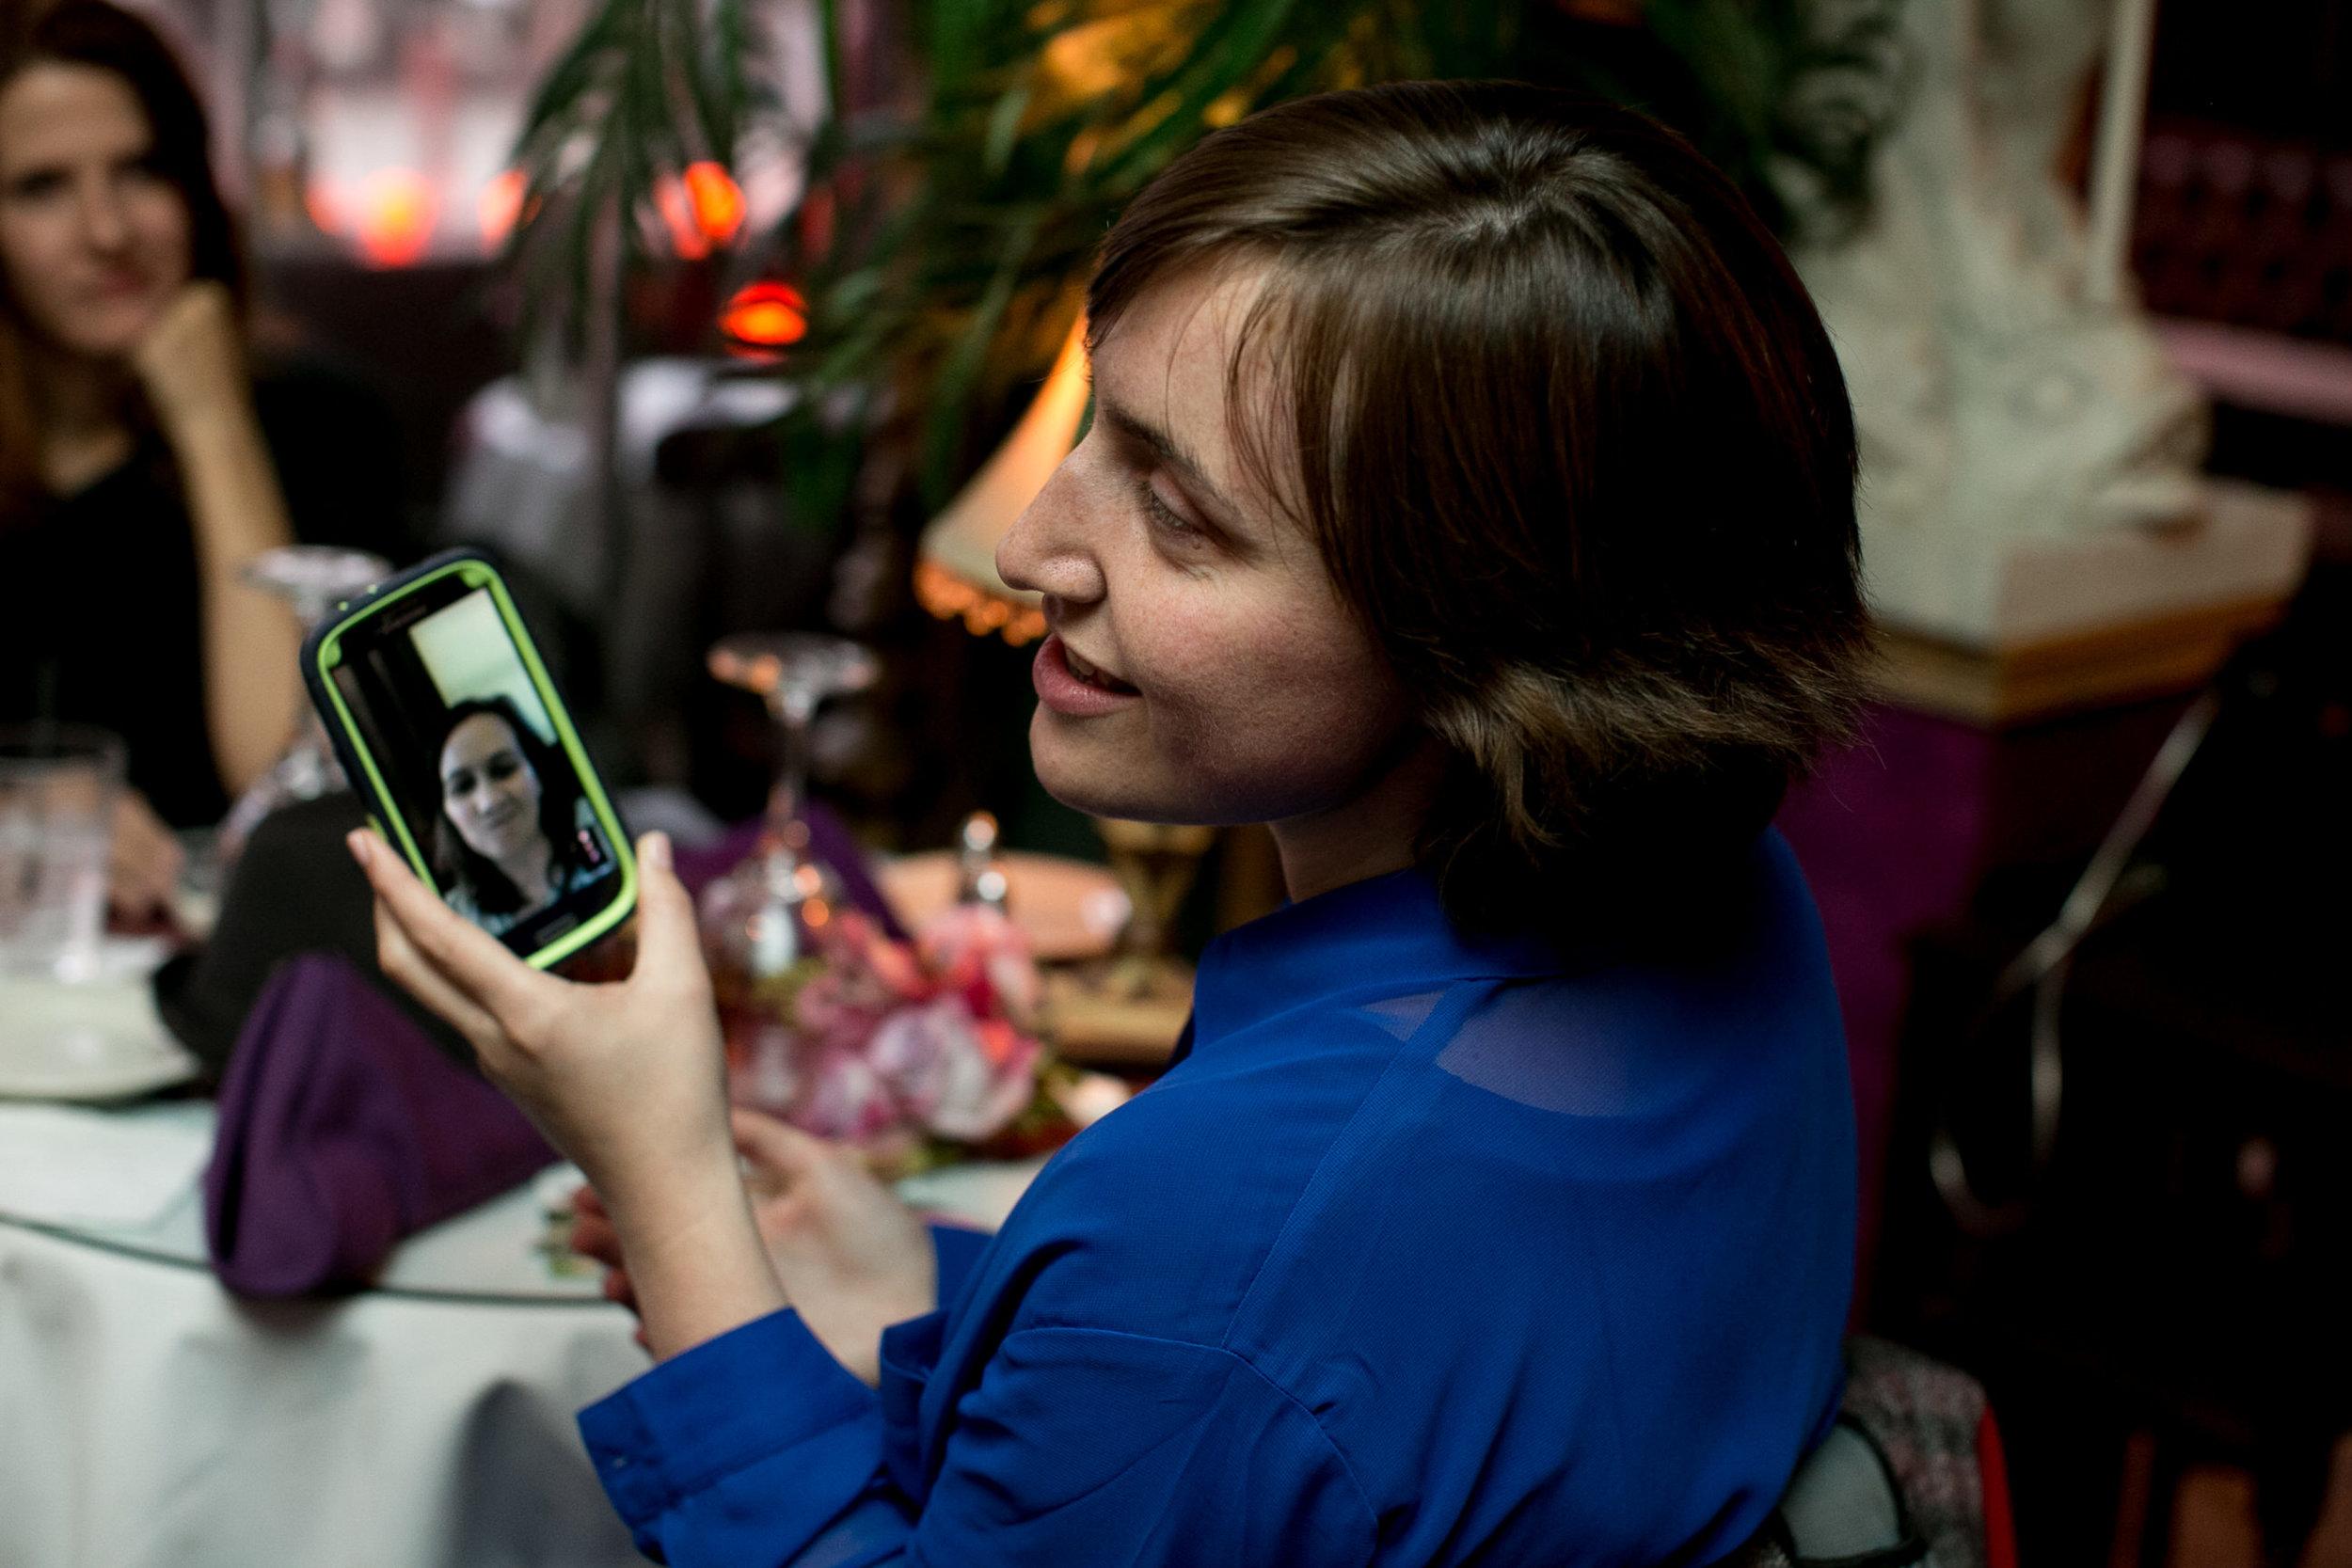 06 Philadelphia Event Planner Surprise Engagement at First Date Restaurant.jpg